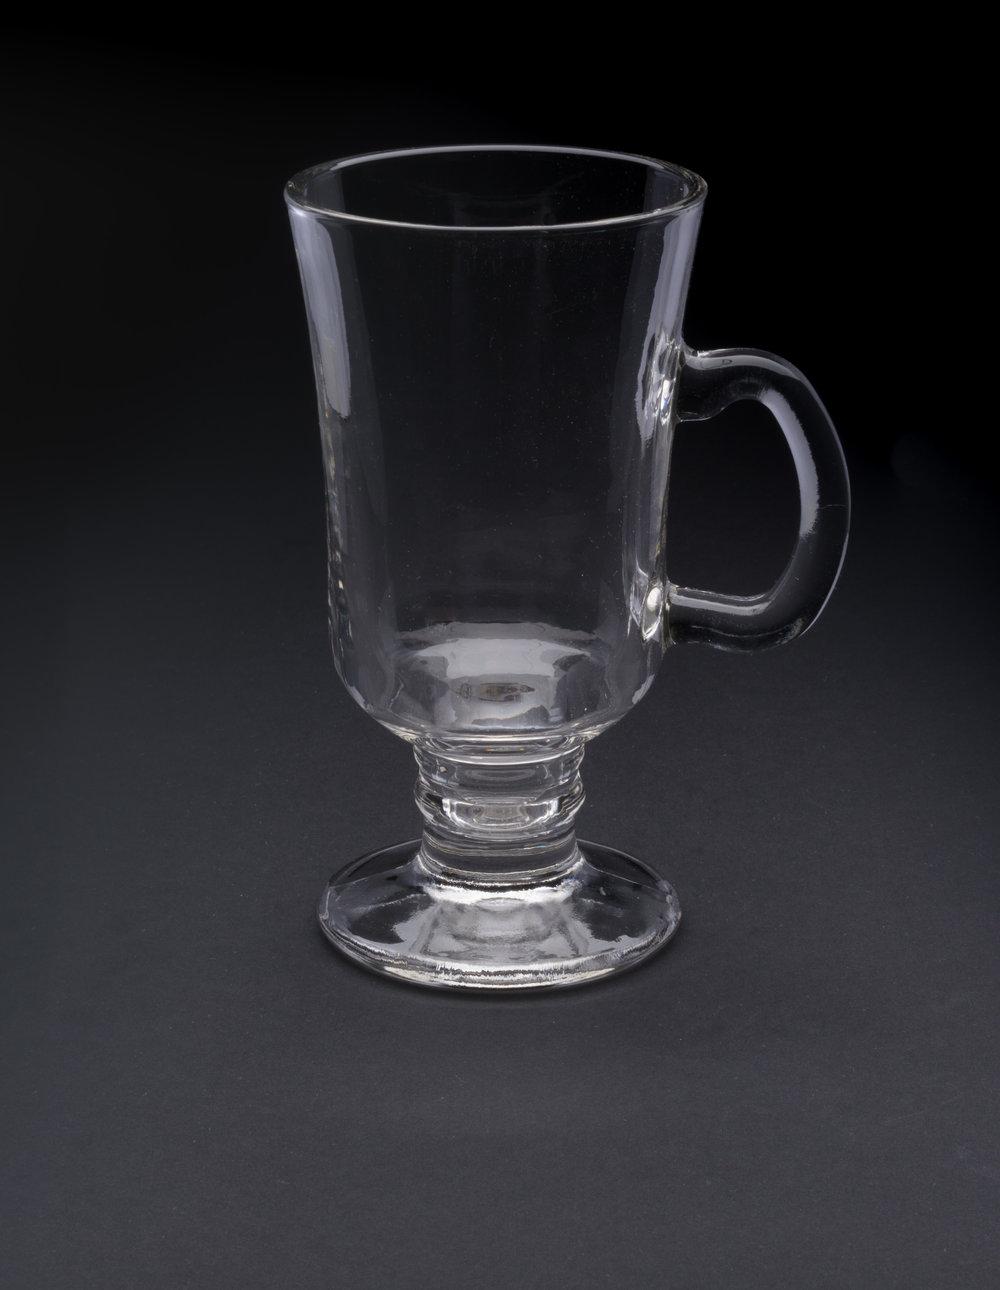 Spanish Coffee Mug